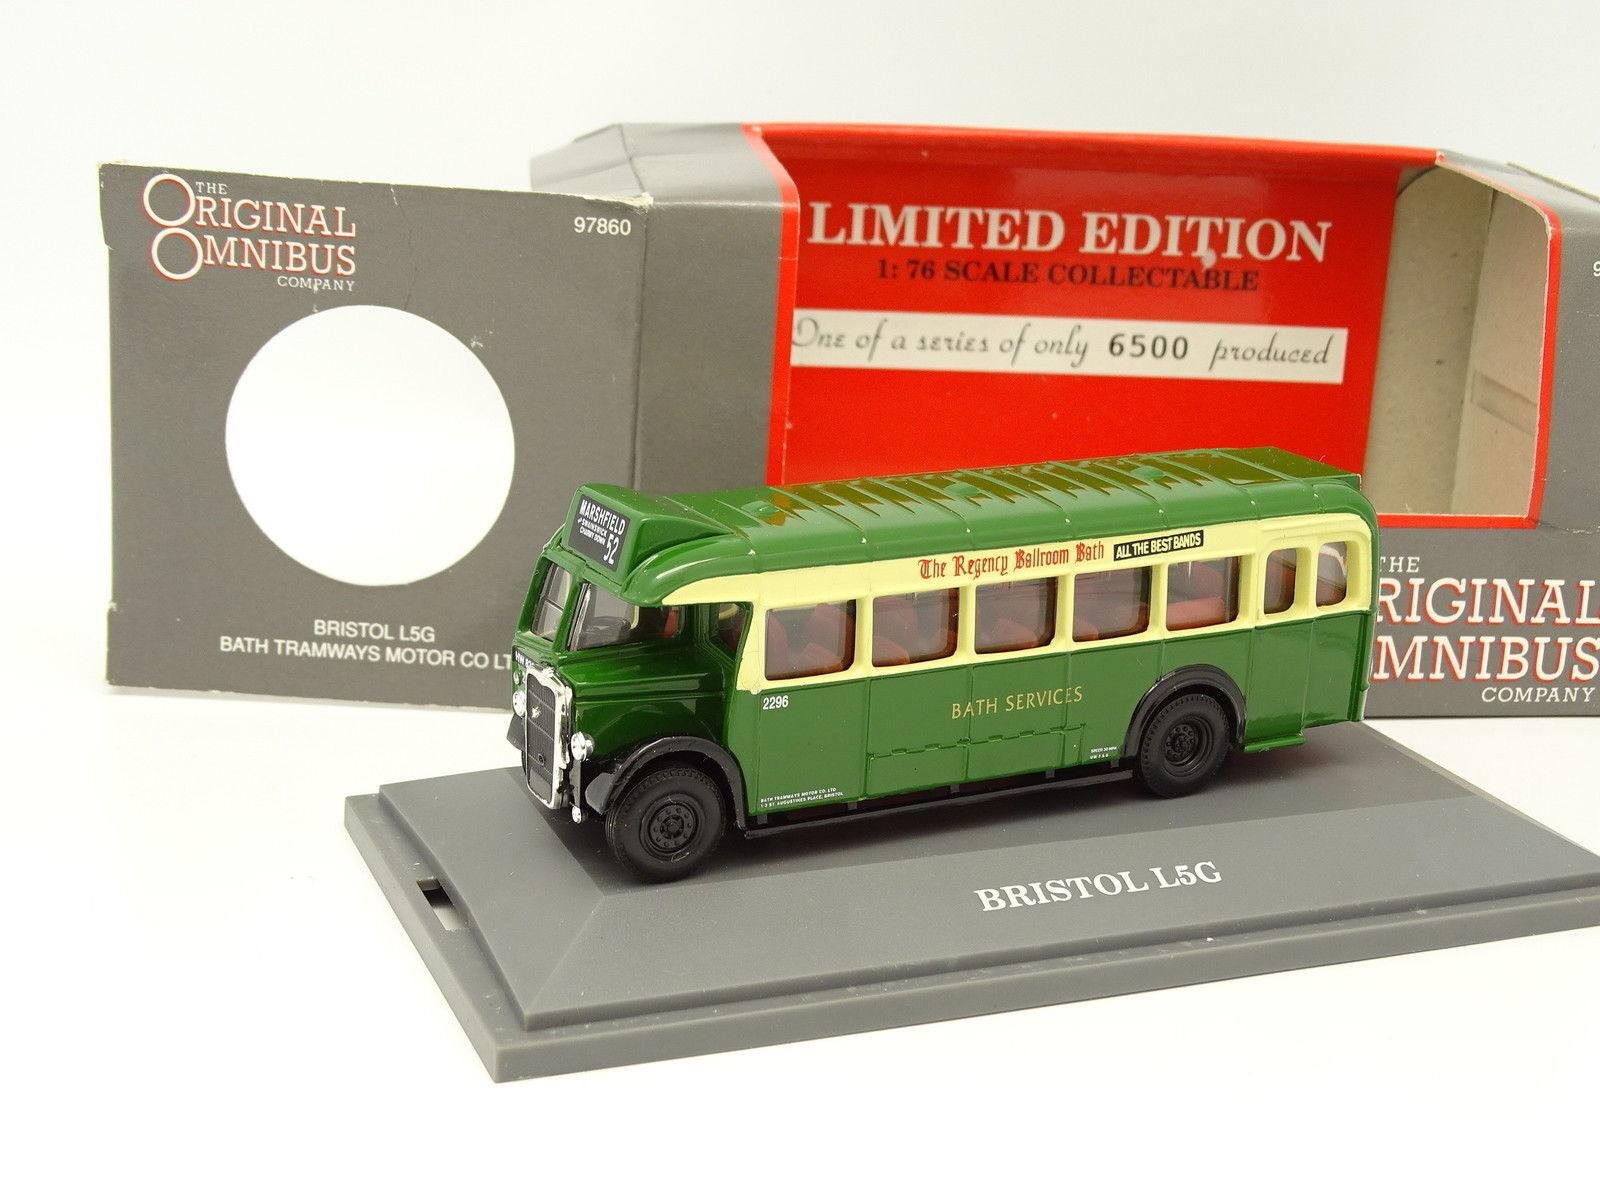 Corgi 1 76 - Bus Bus Car Bristol L5G Bath